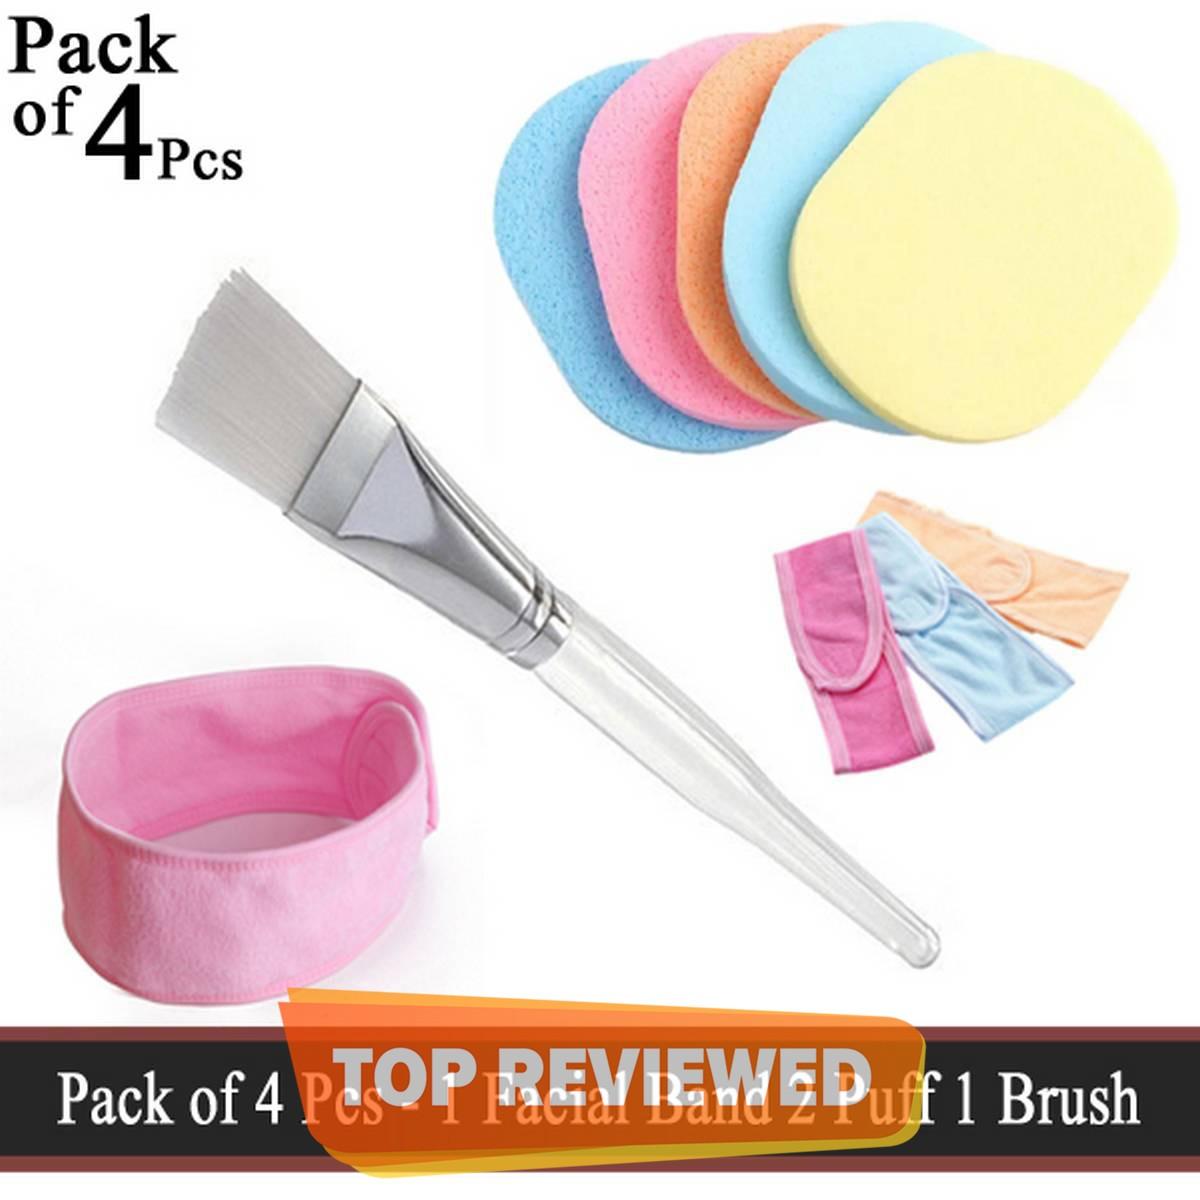 Pack of 4 Pcs - 1 Facial Hair Band 2 Sponge Puff 1 Facial Mixing Brush - Facial Face Wash Cleansing Sponge Puff Pad Makeup Remover Puff